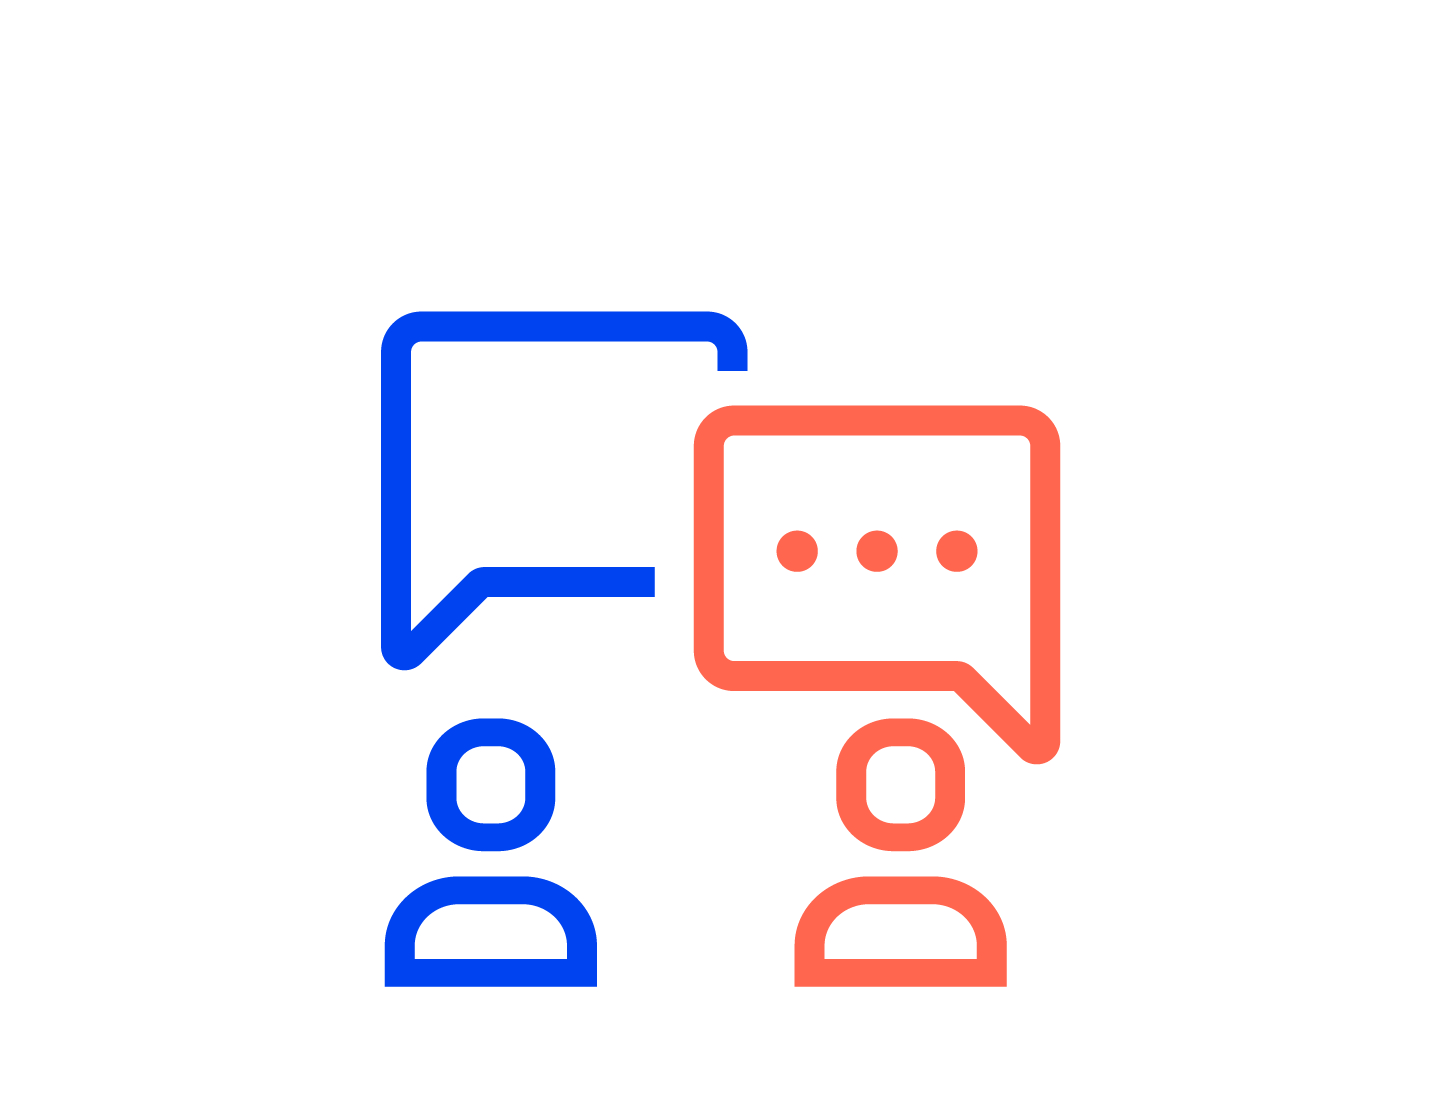 https://www.ufcm.co.uk/wp-content/uploads/2020/12/tech-support-icon-01.jpg